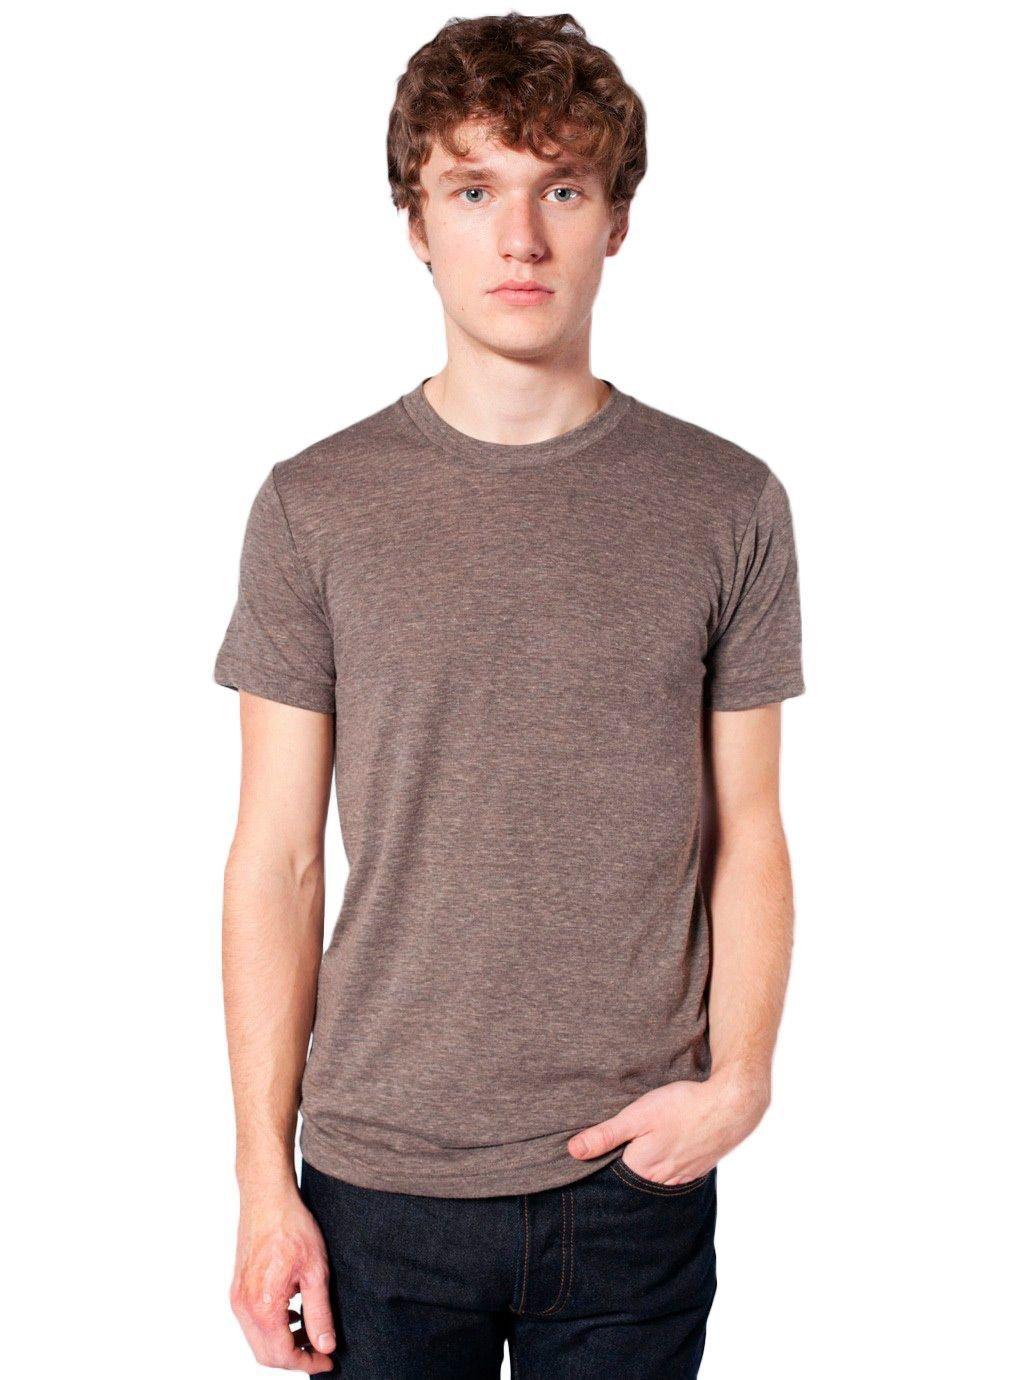 American Apparel Unisex Tri-Blend Short Sleeve Track Shirt - Tri-Coffee / S